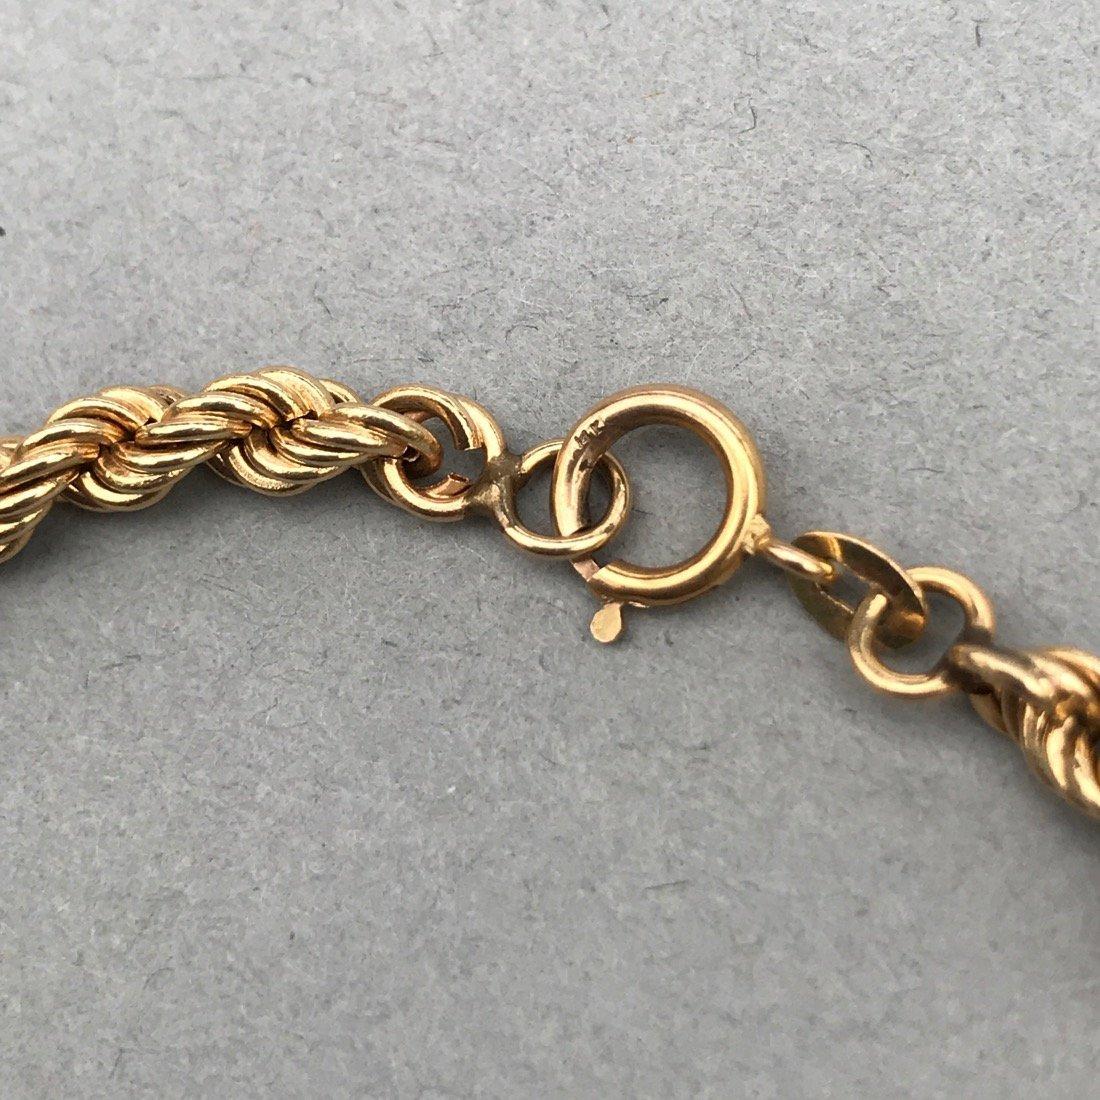 14K Gold Twisted Chain Bracelet - 2